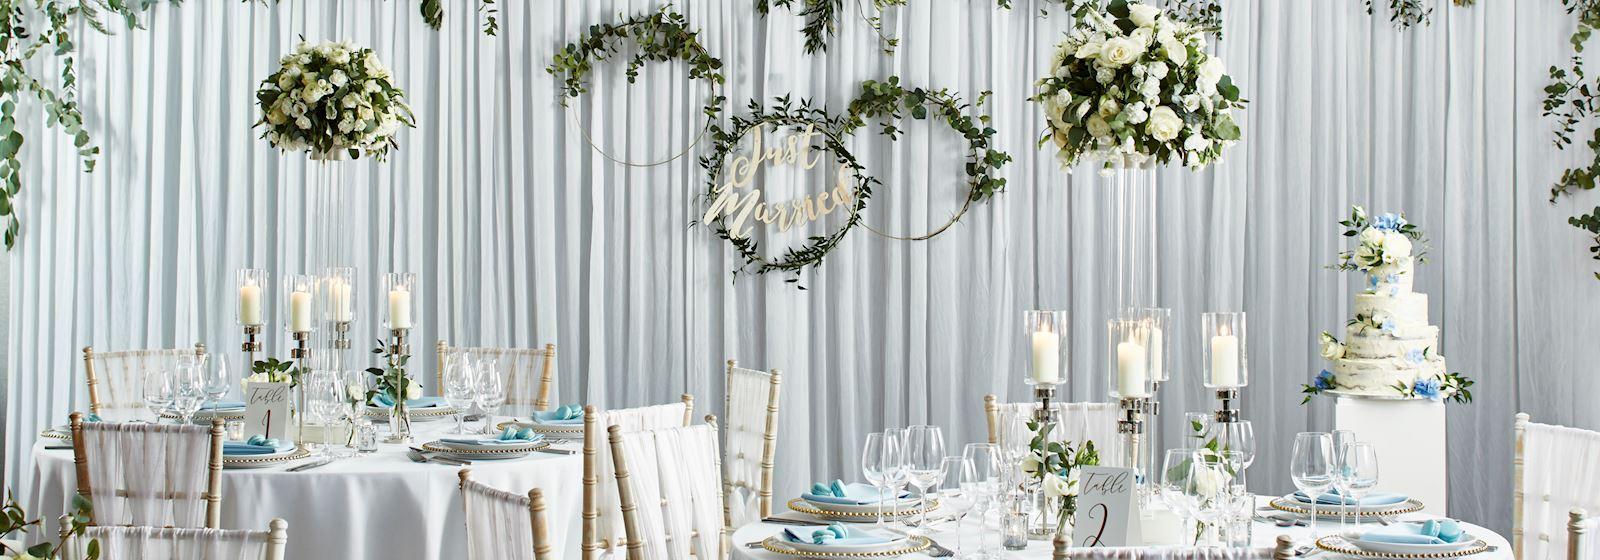 Bexleyheath Marriott Hotel Weddings